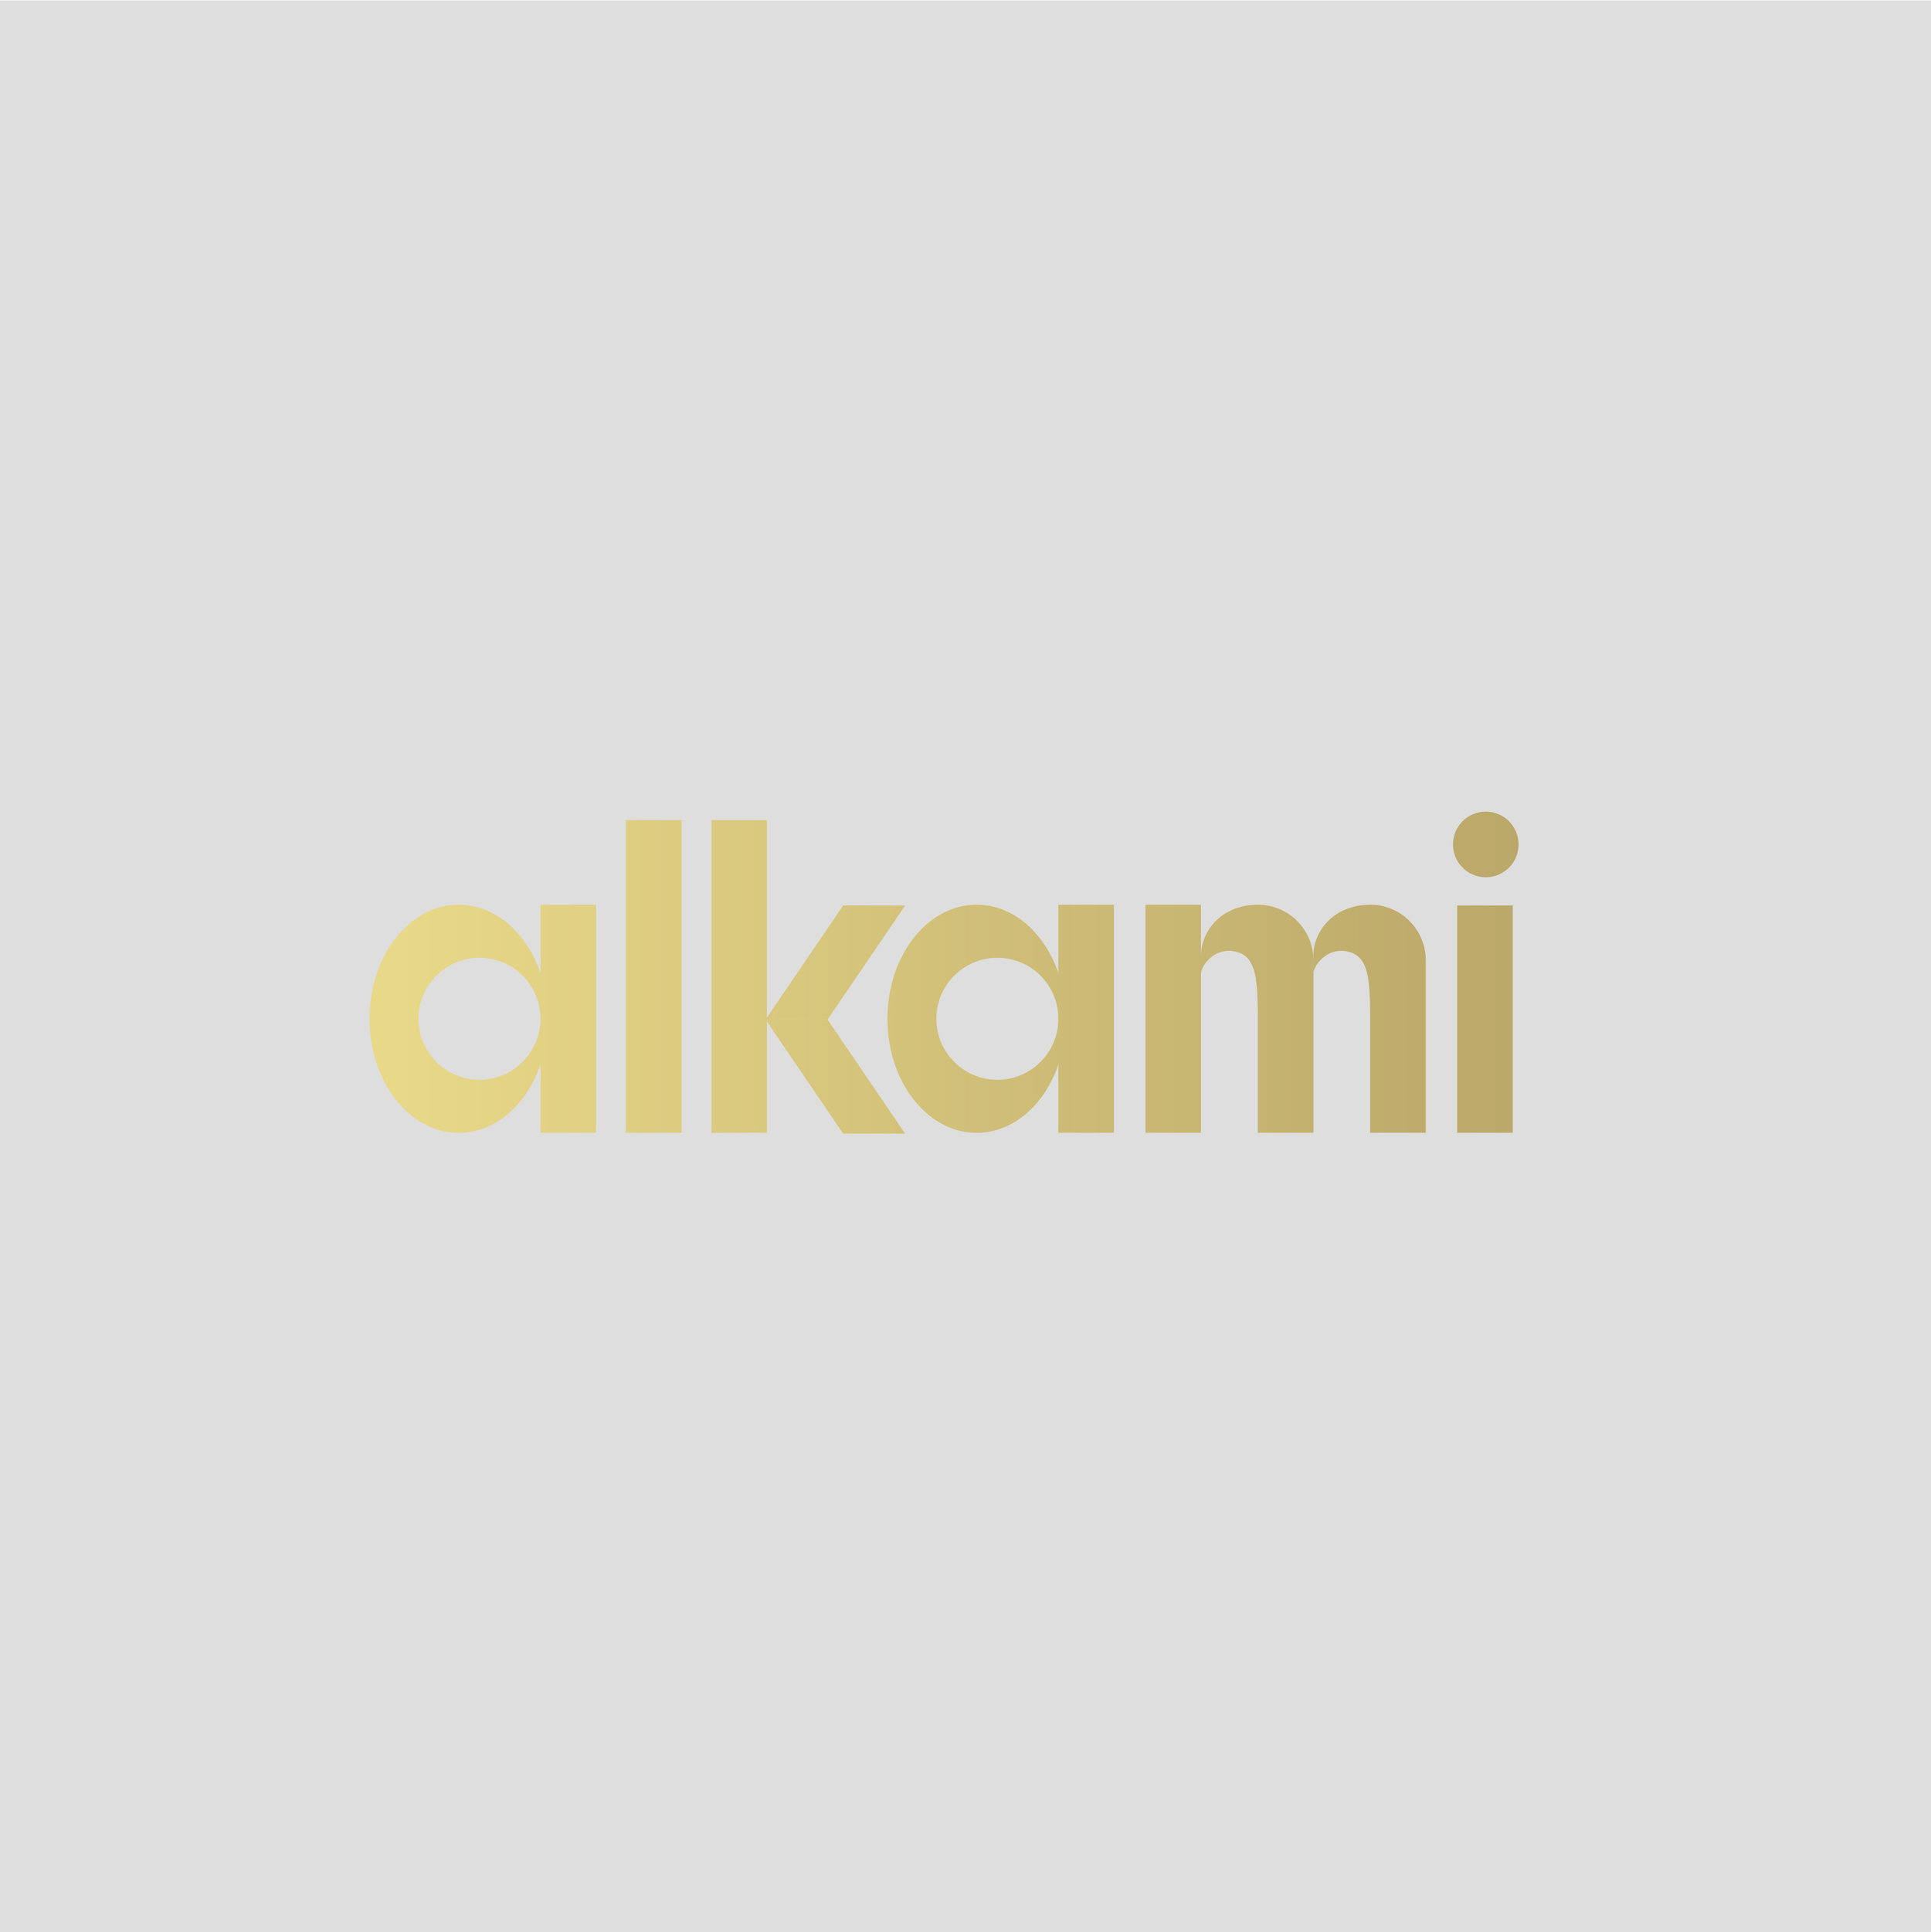 Alkami Logotype